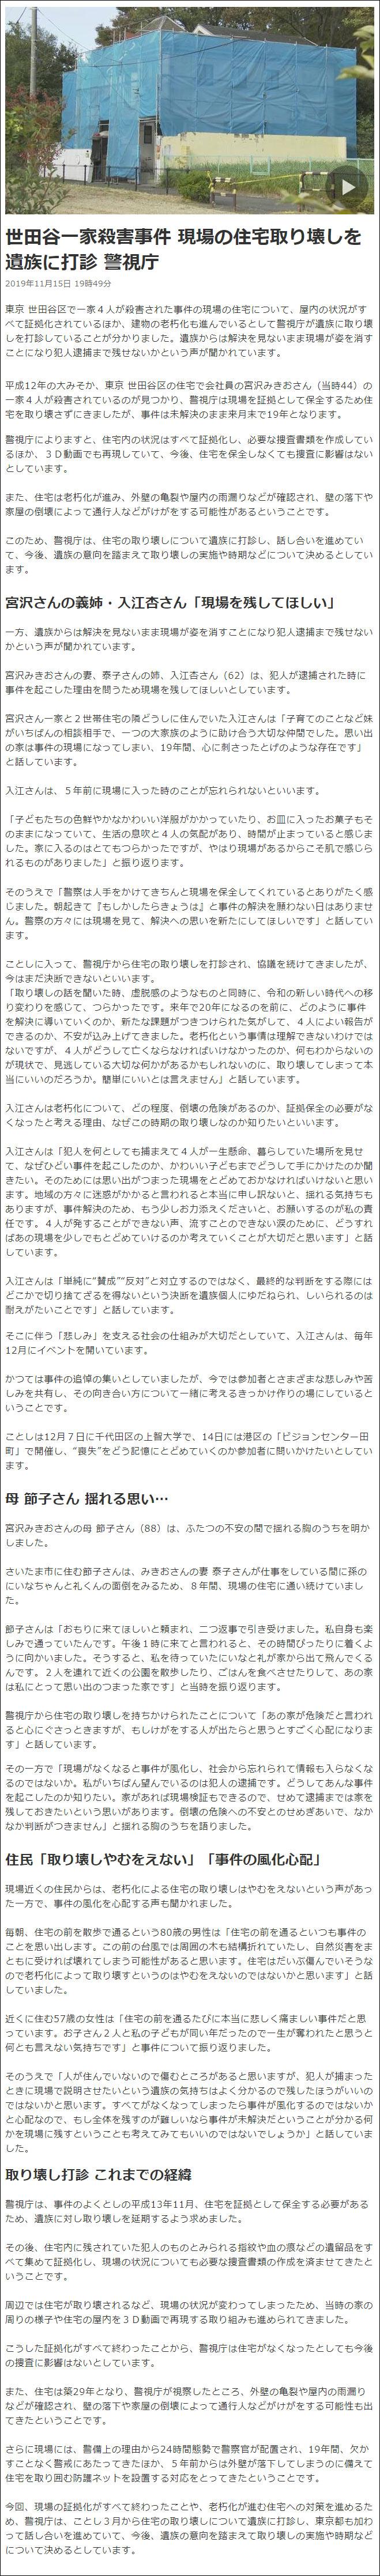 入江杏:NHK NEWS、2019年11月15日「世田谷一家殺害事件 現場の住宅取り壊しを遺族に打診 警視庁」放送